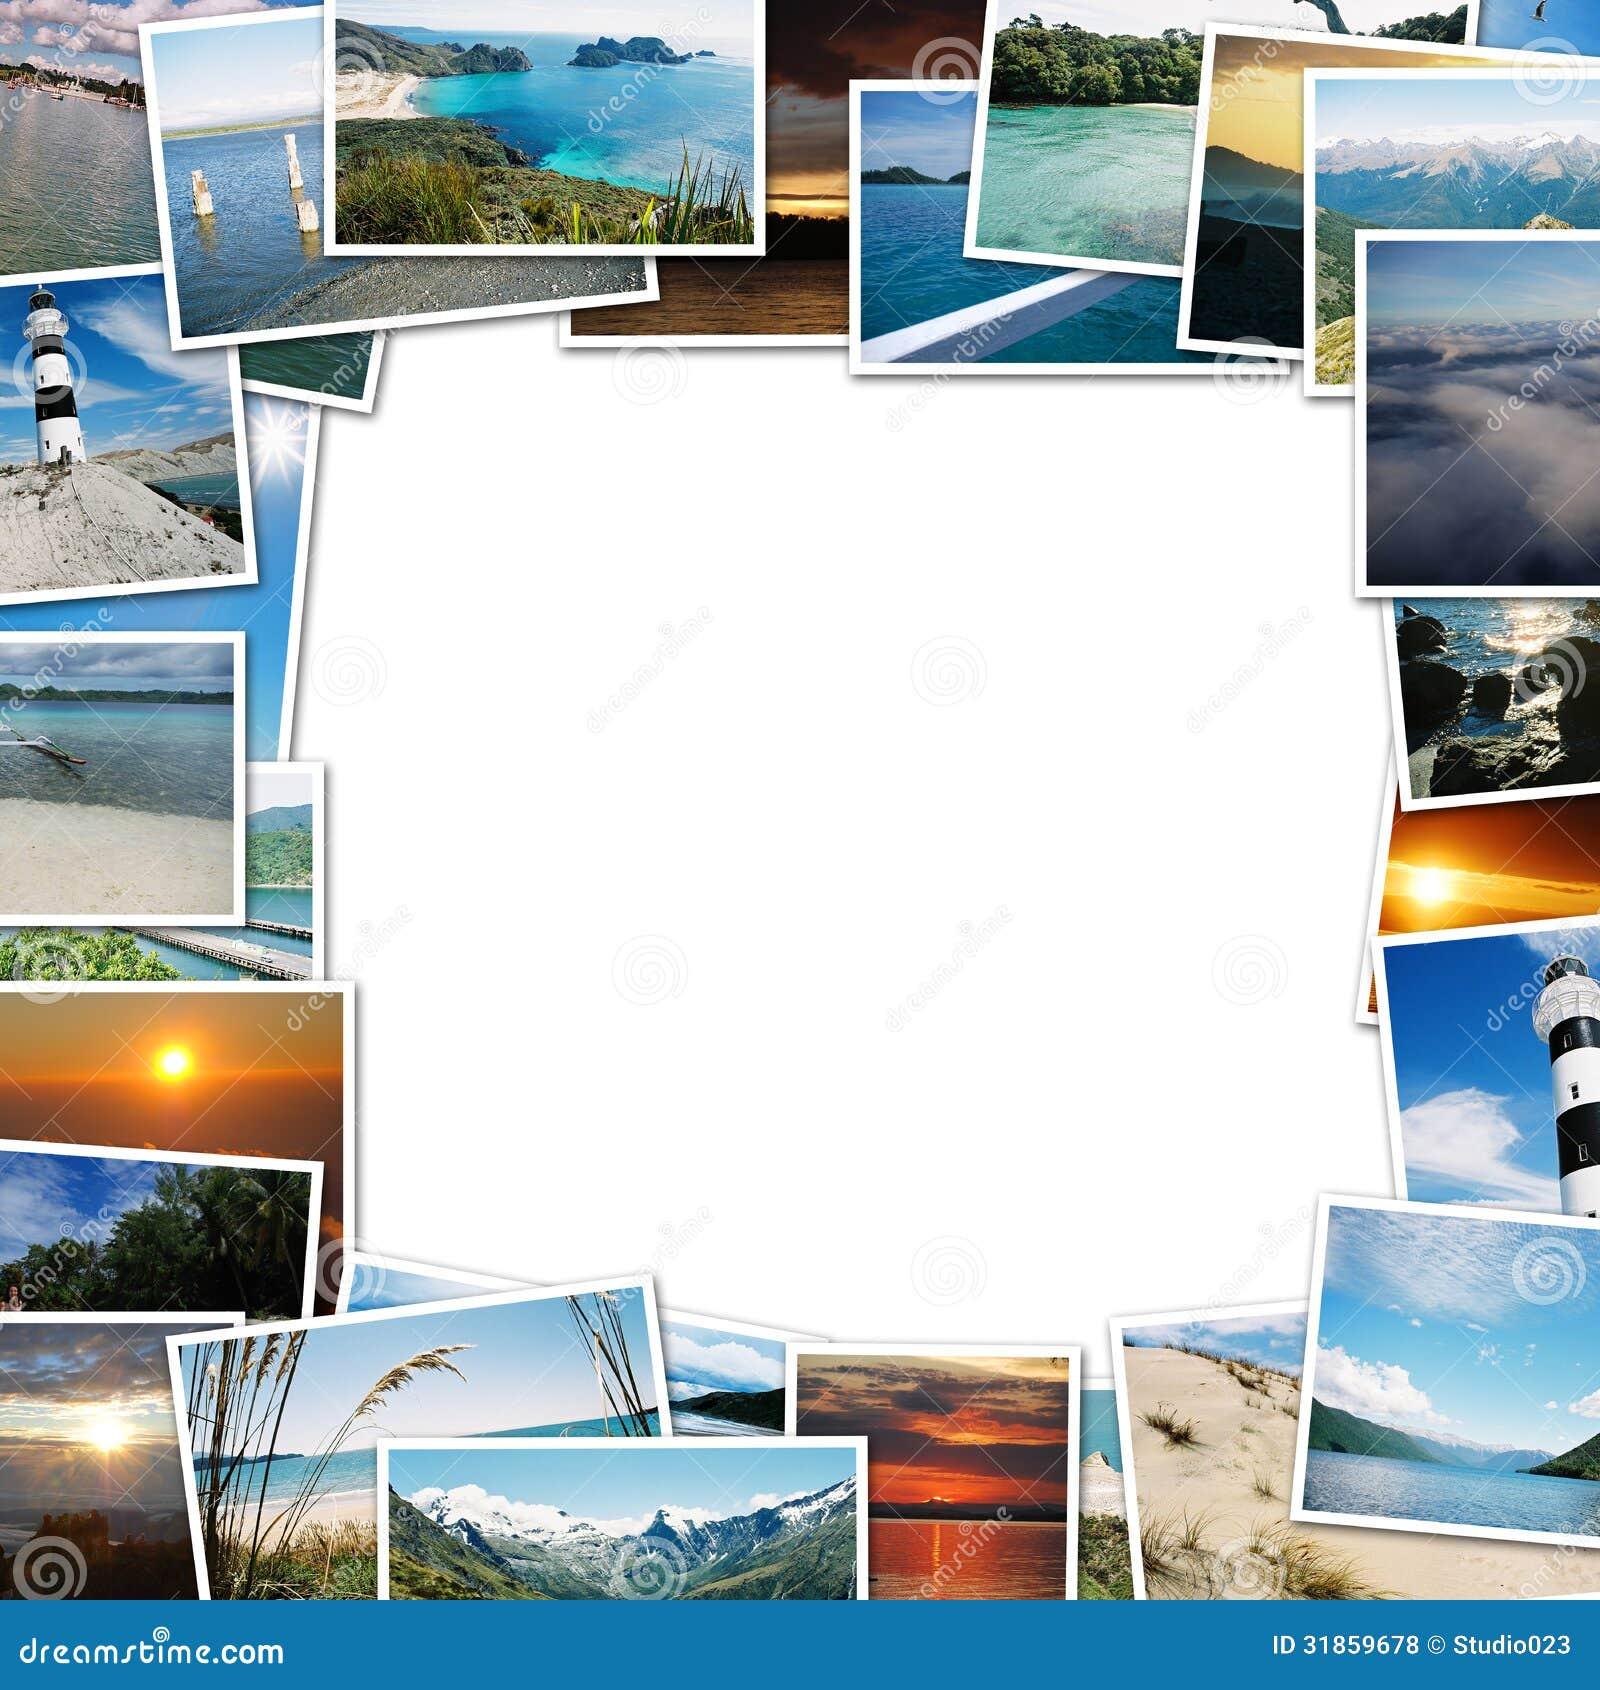 Frame of travel photos stock illustration. Illustration of nature ...